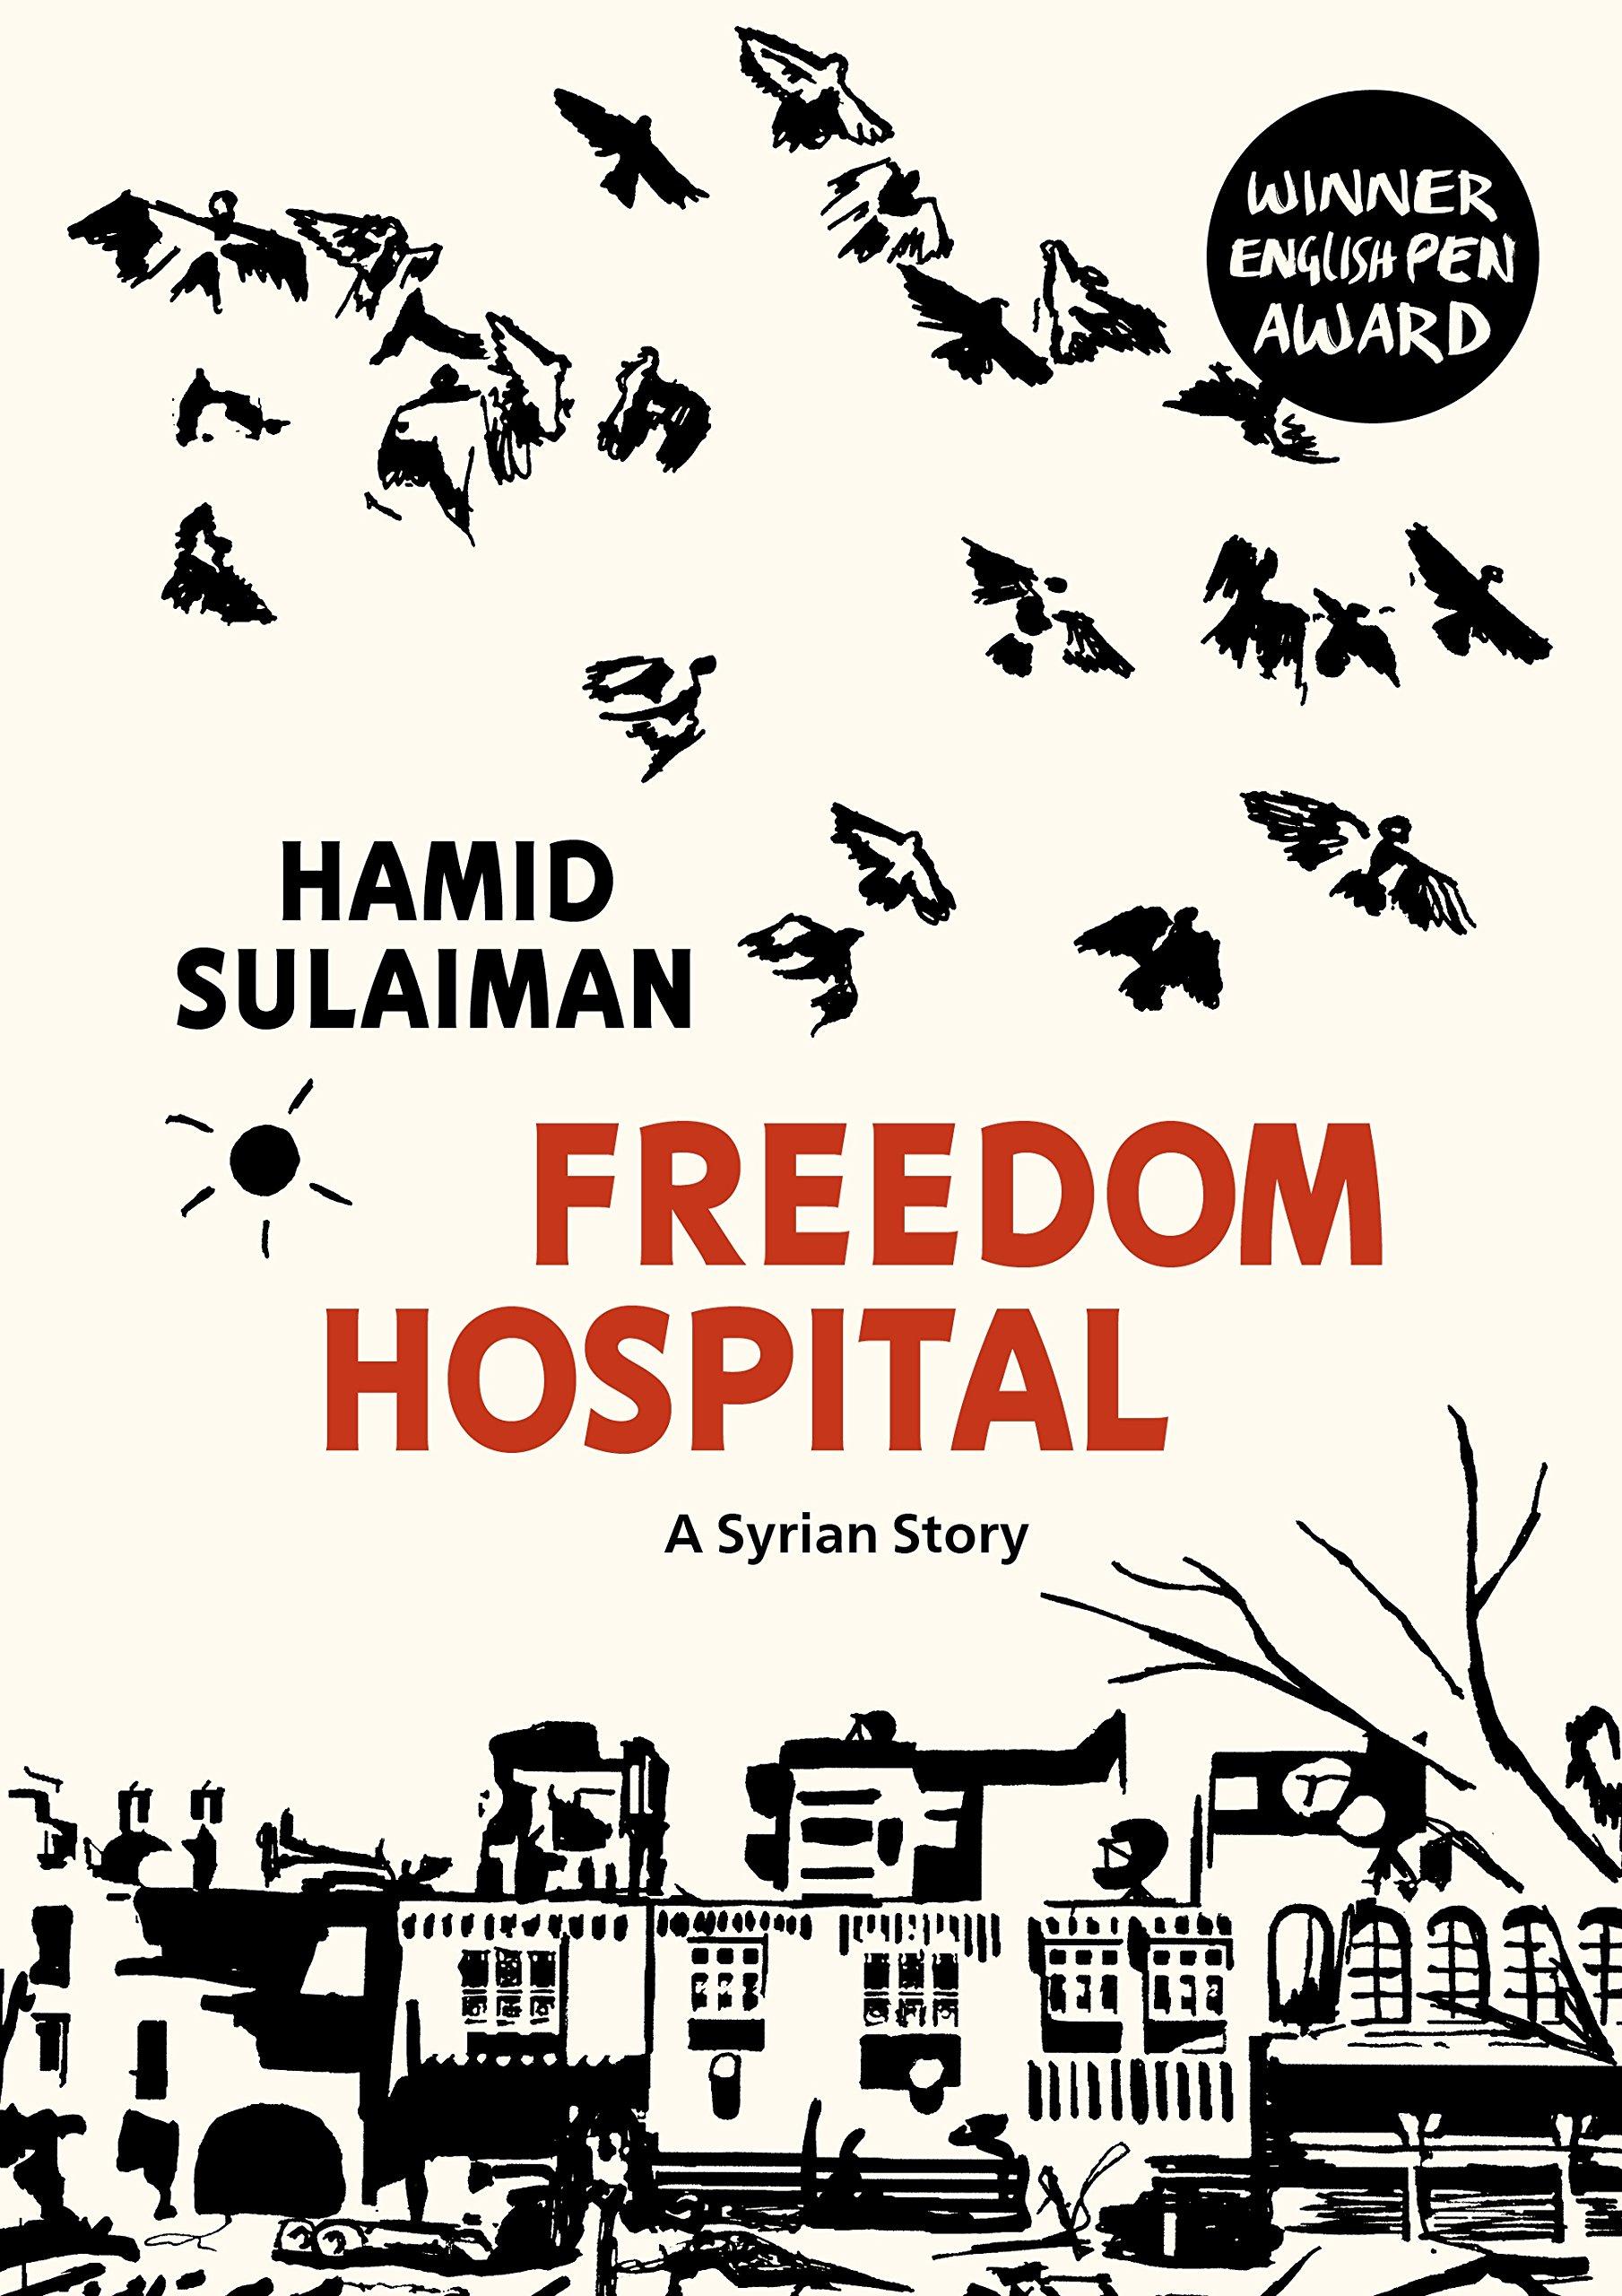 freedomhospital